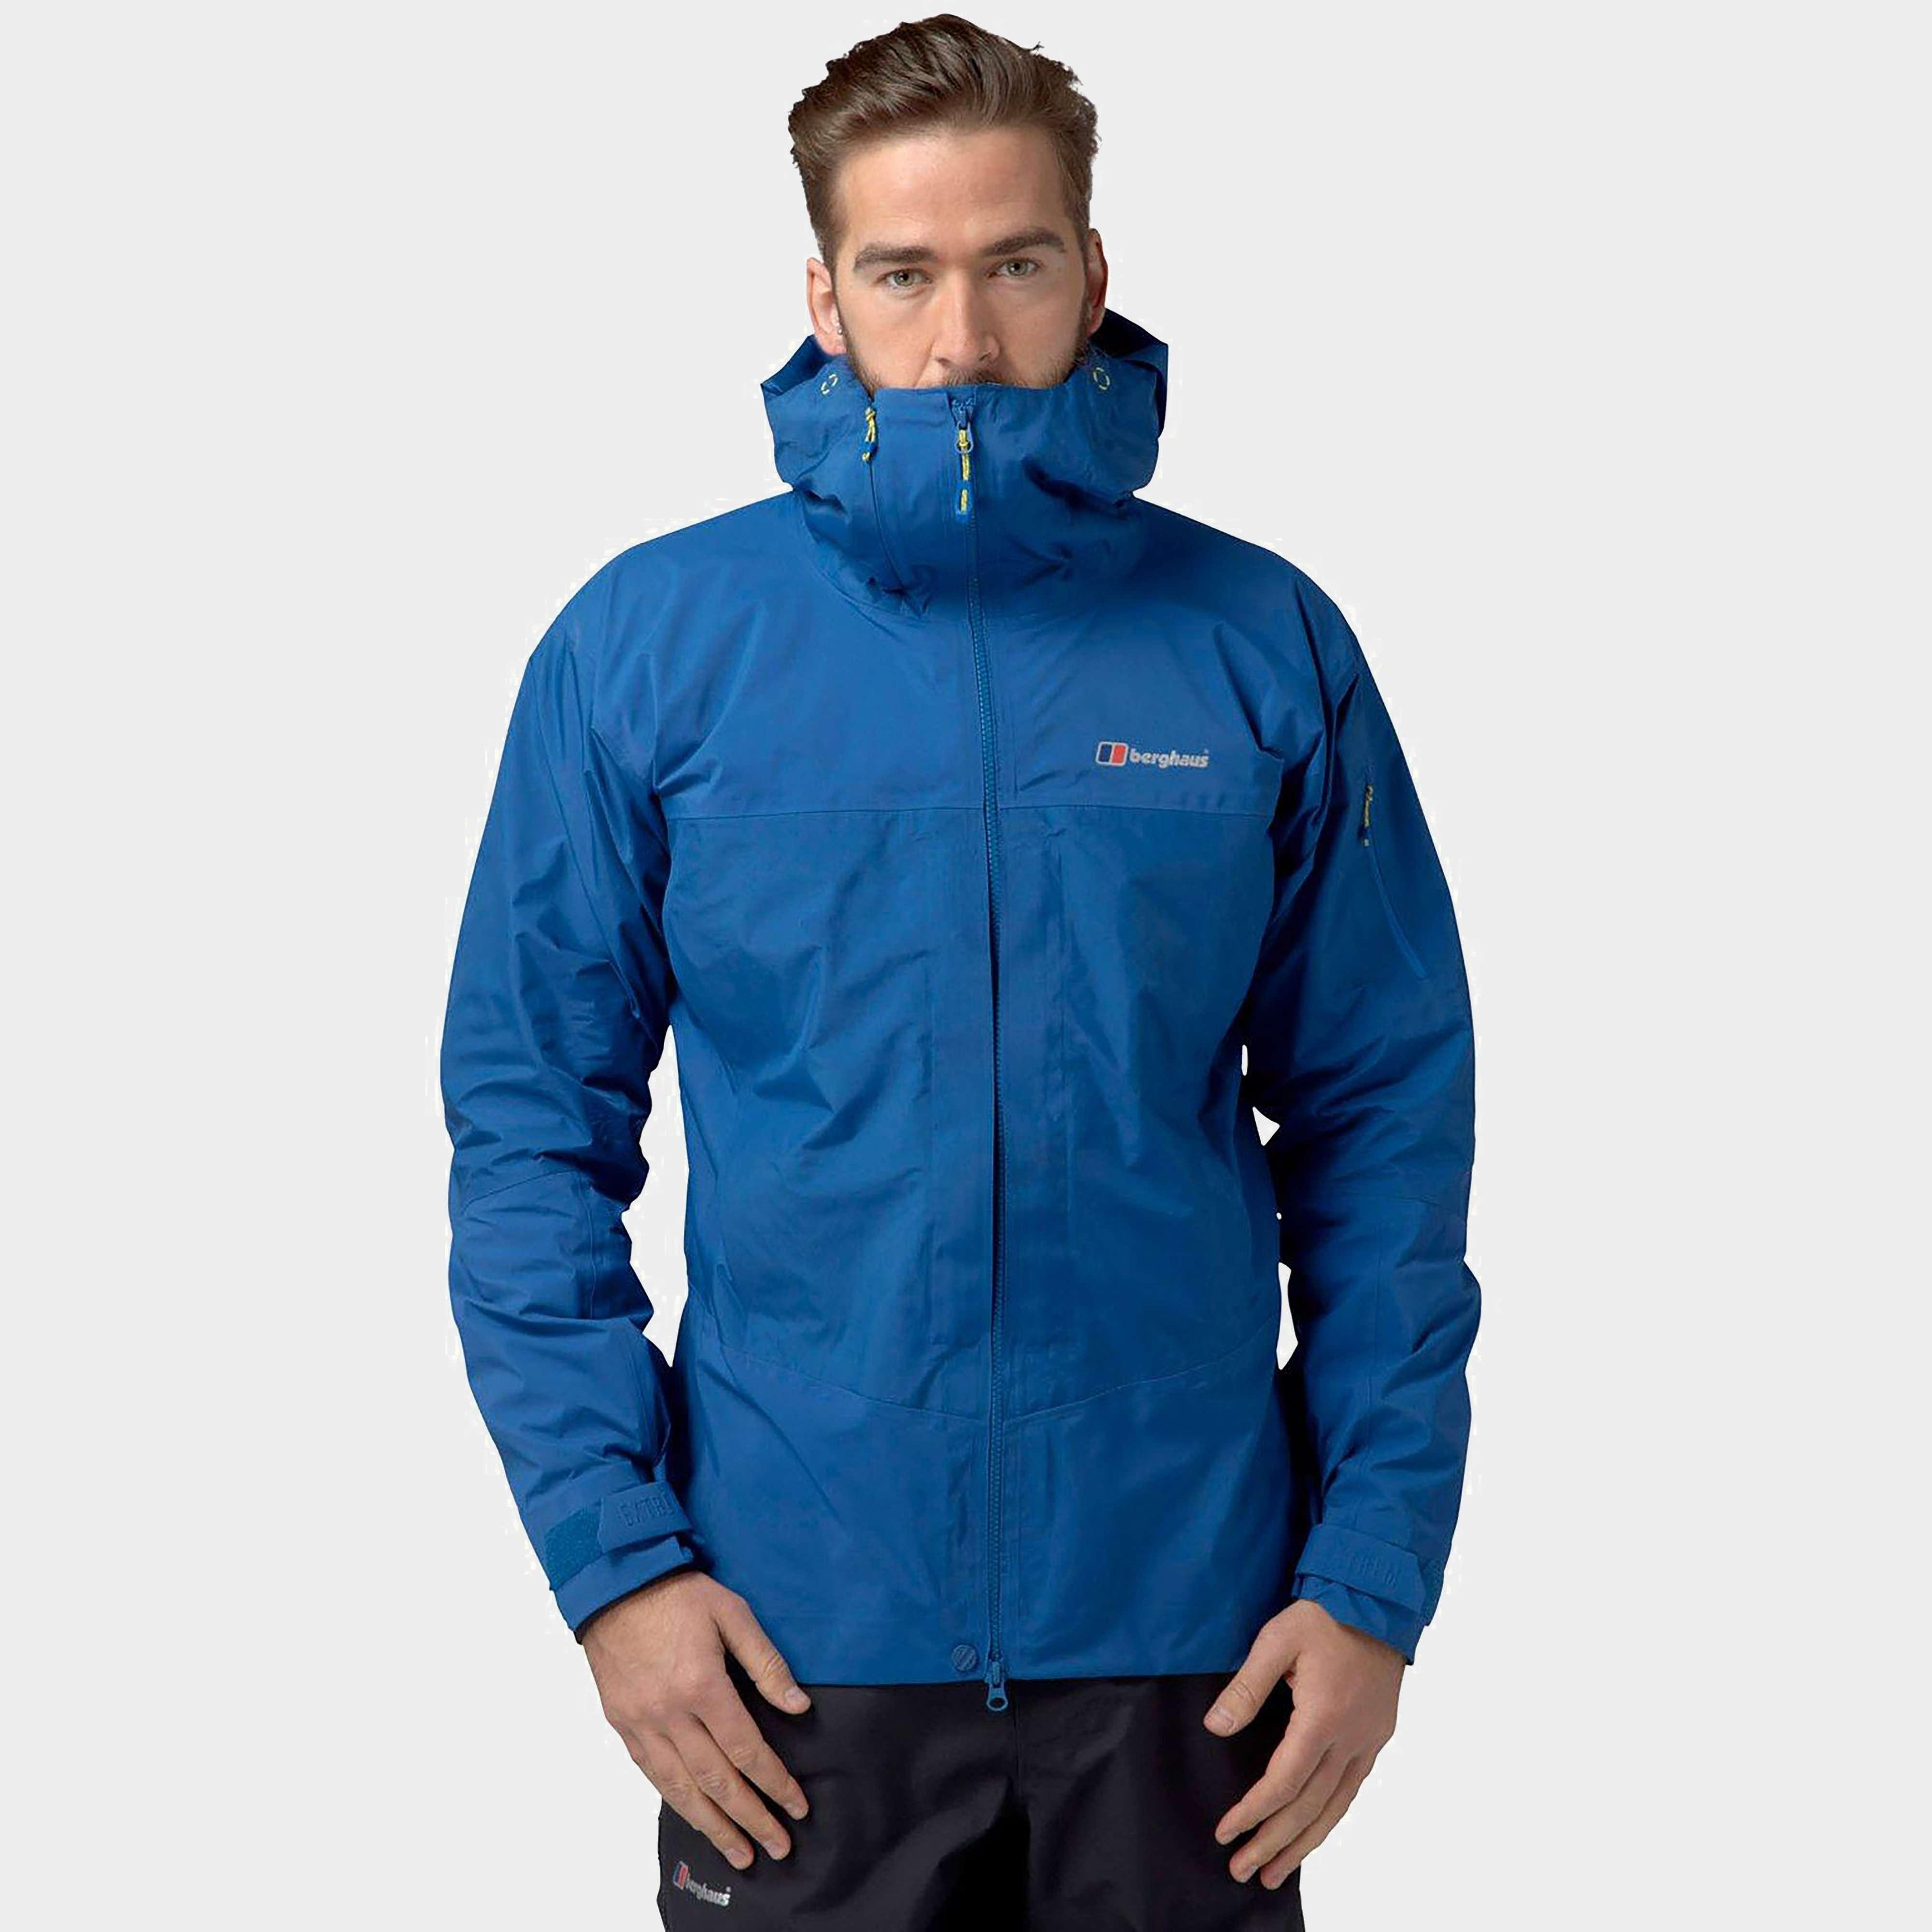 BERGHAUS Men's Extrem 8000 Pro GORE-TEX® Jacket